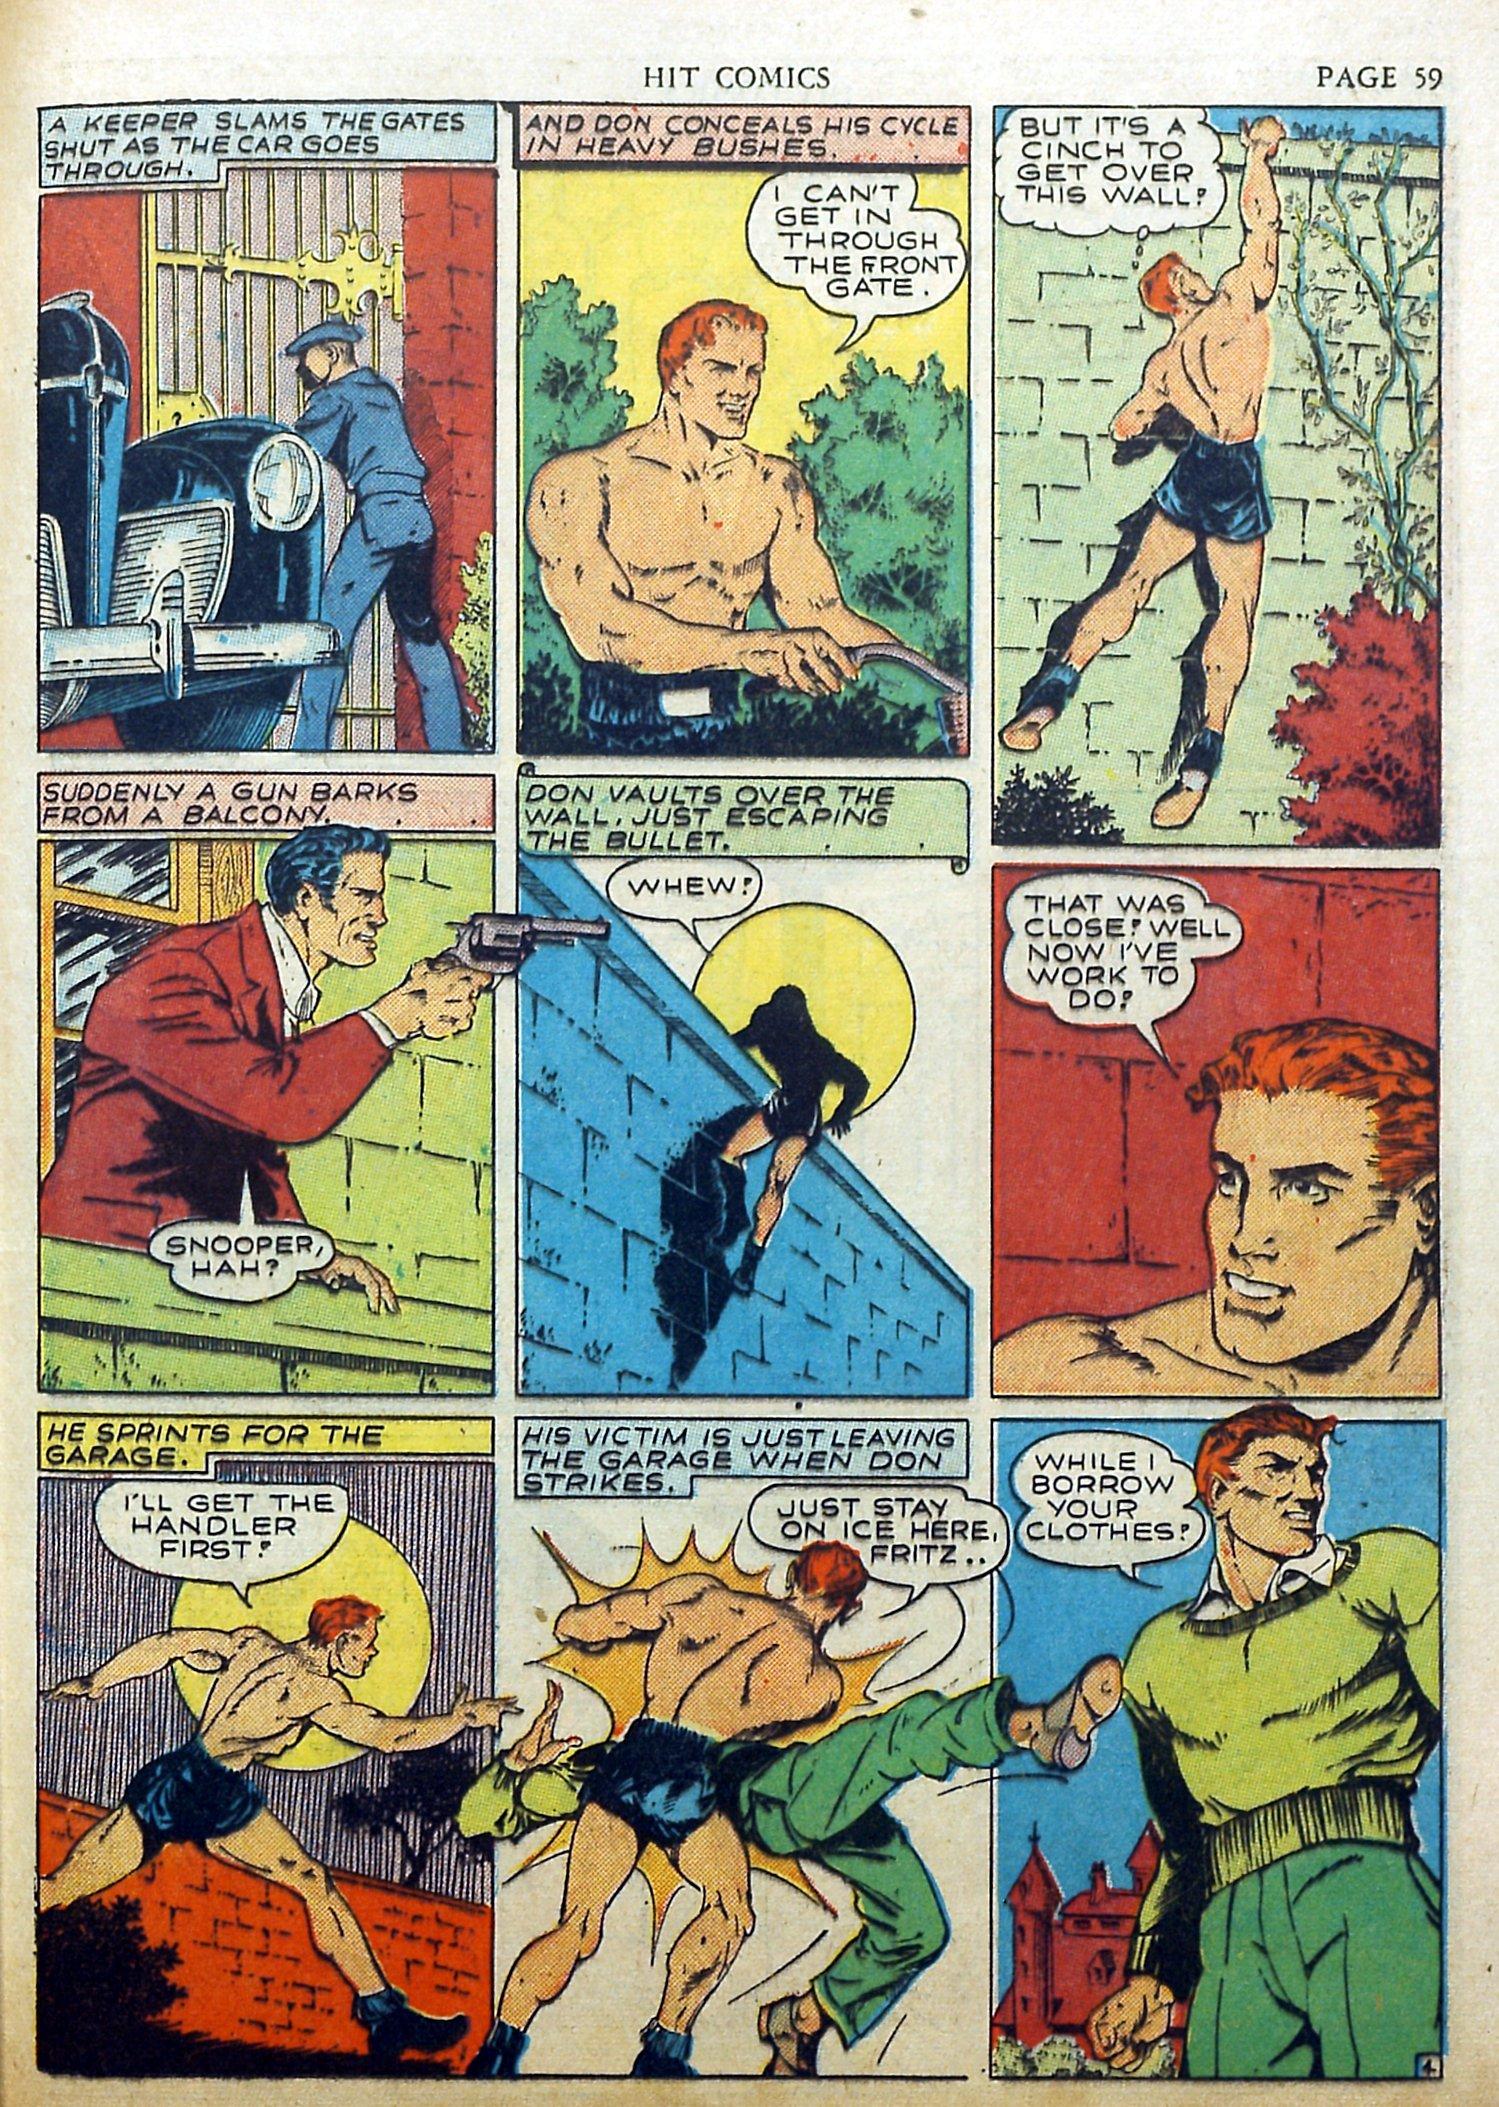 Read online Hit Comics comic -  Issue #17 - 61